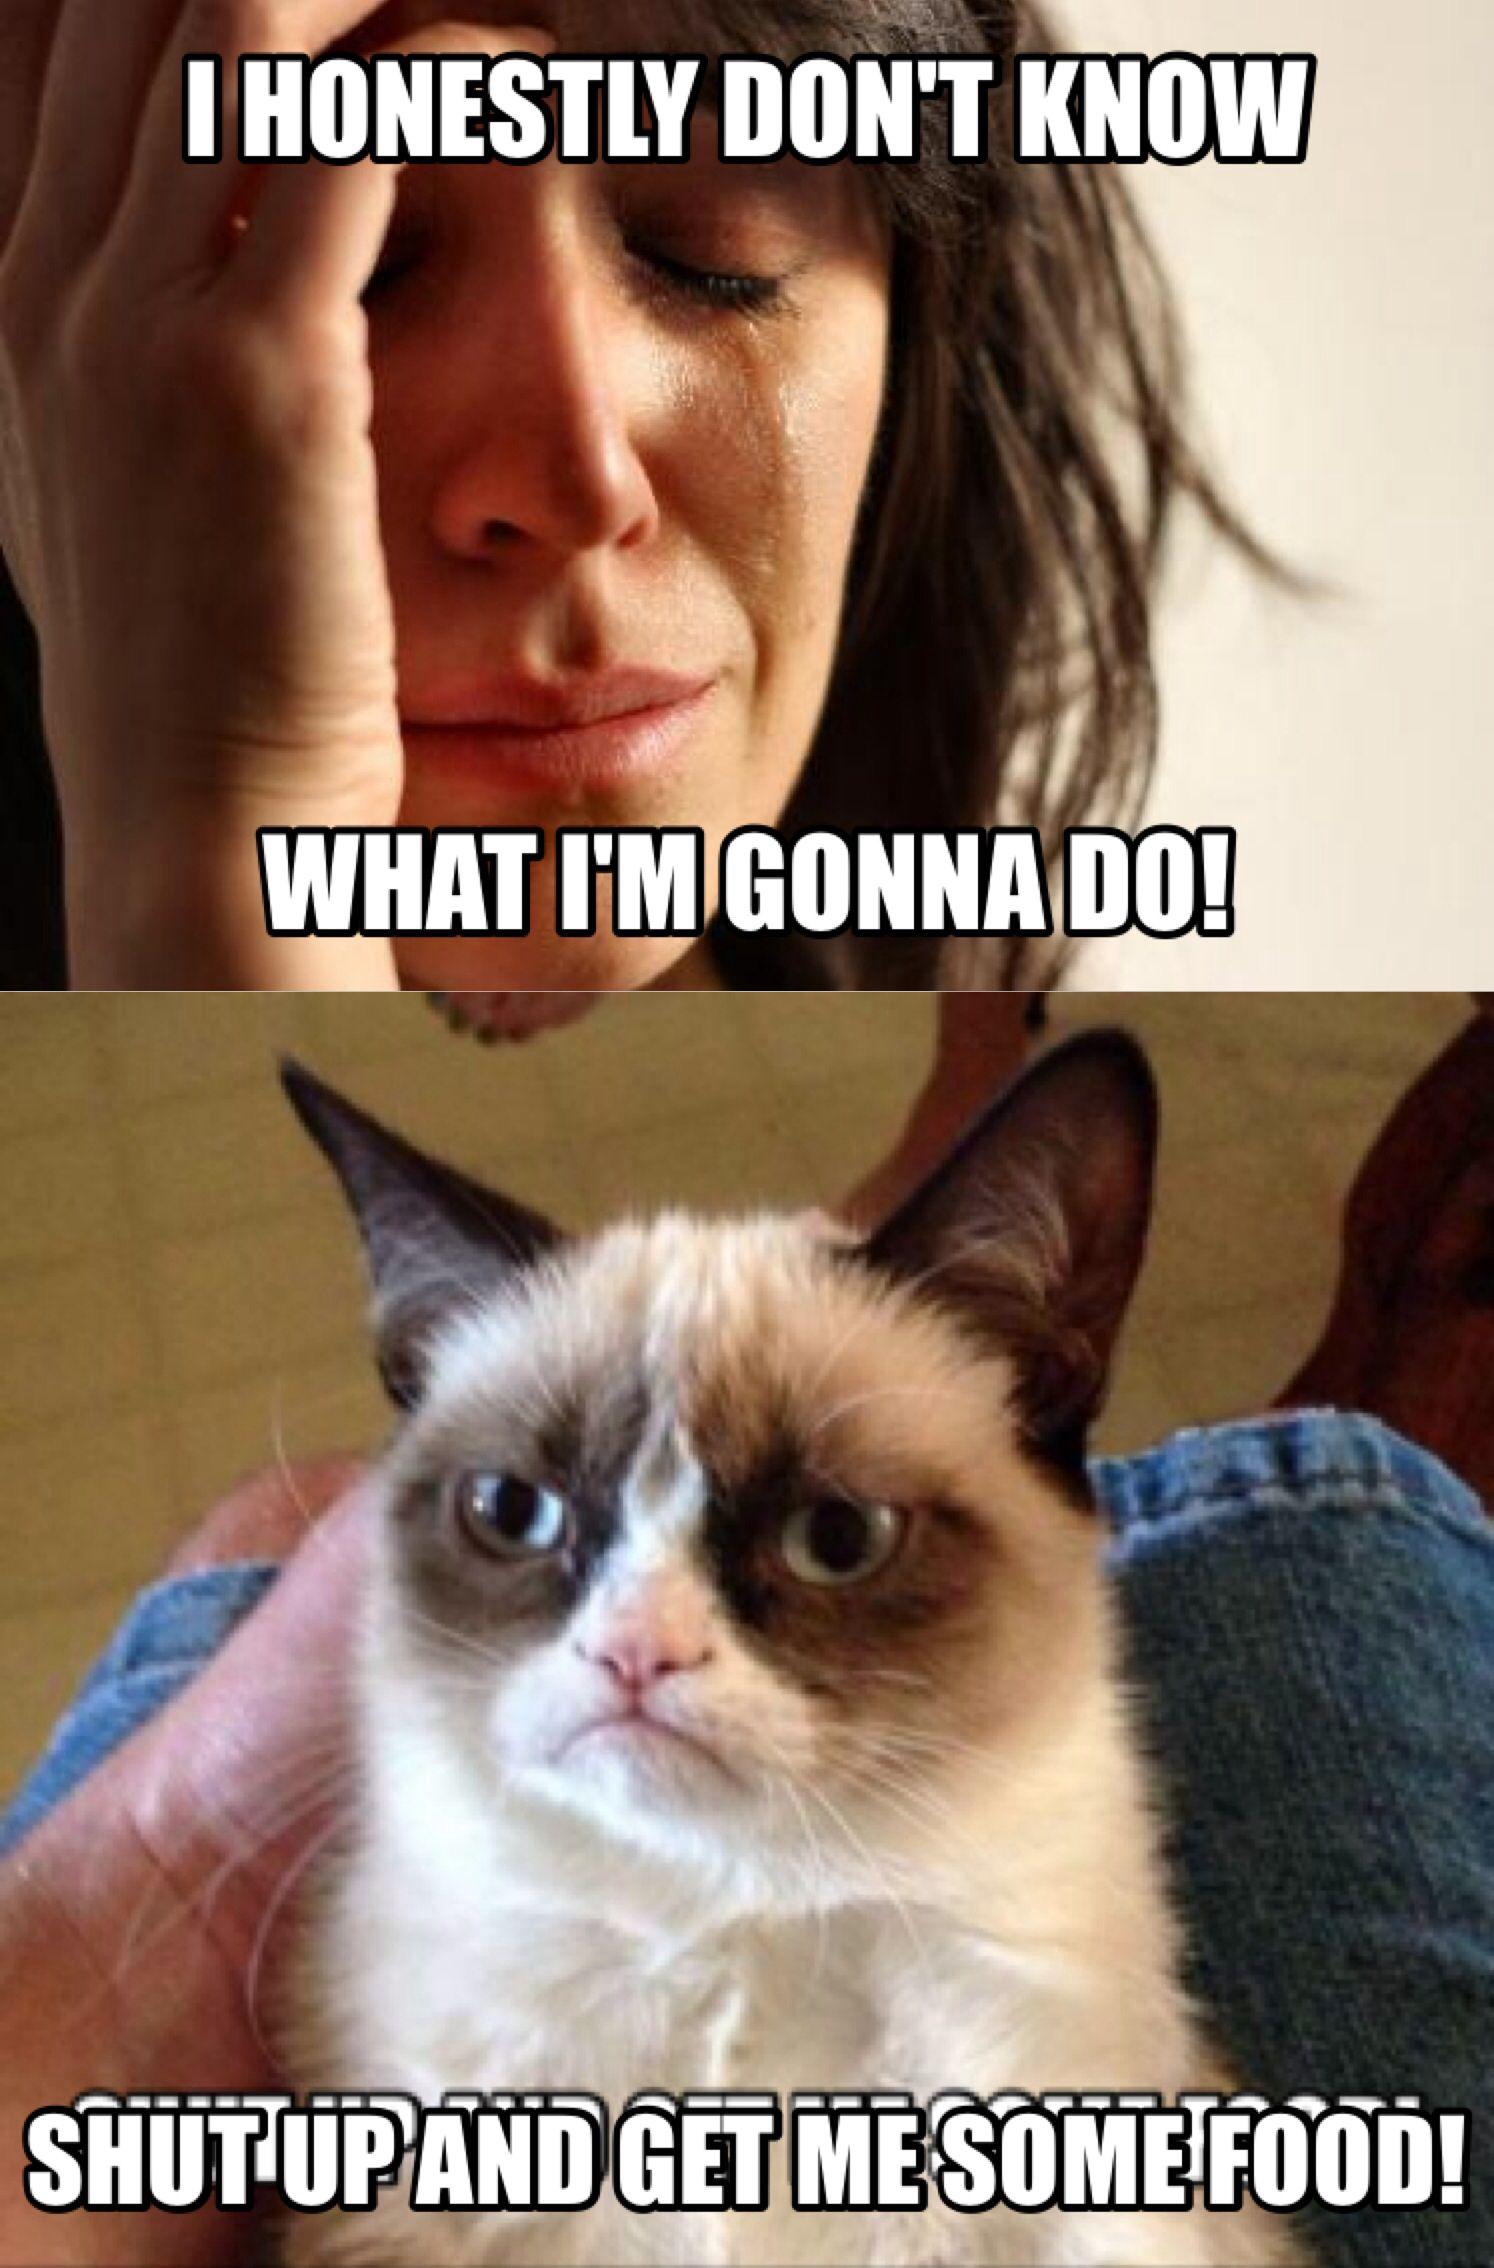 Grumpy cat   Grumpy cat quotes, Grumpy cat, Cuddly animals